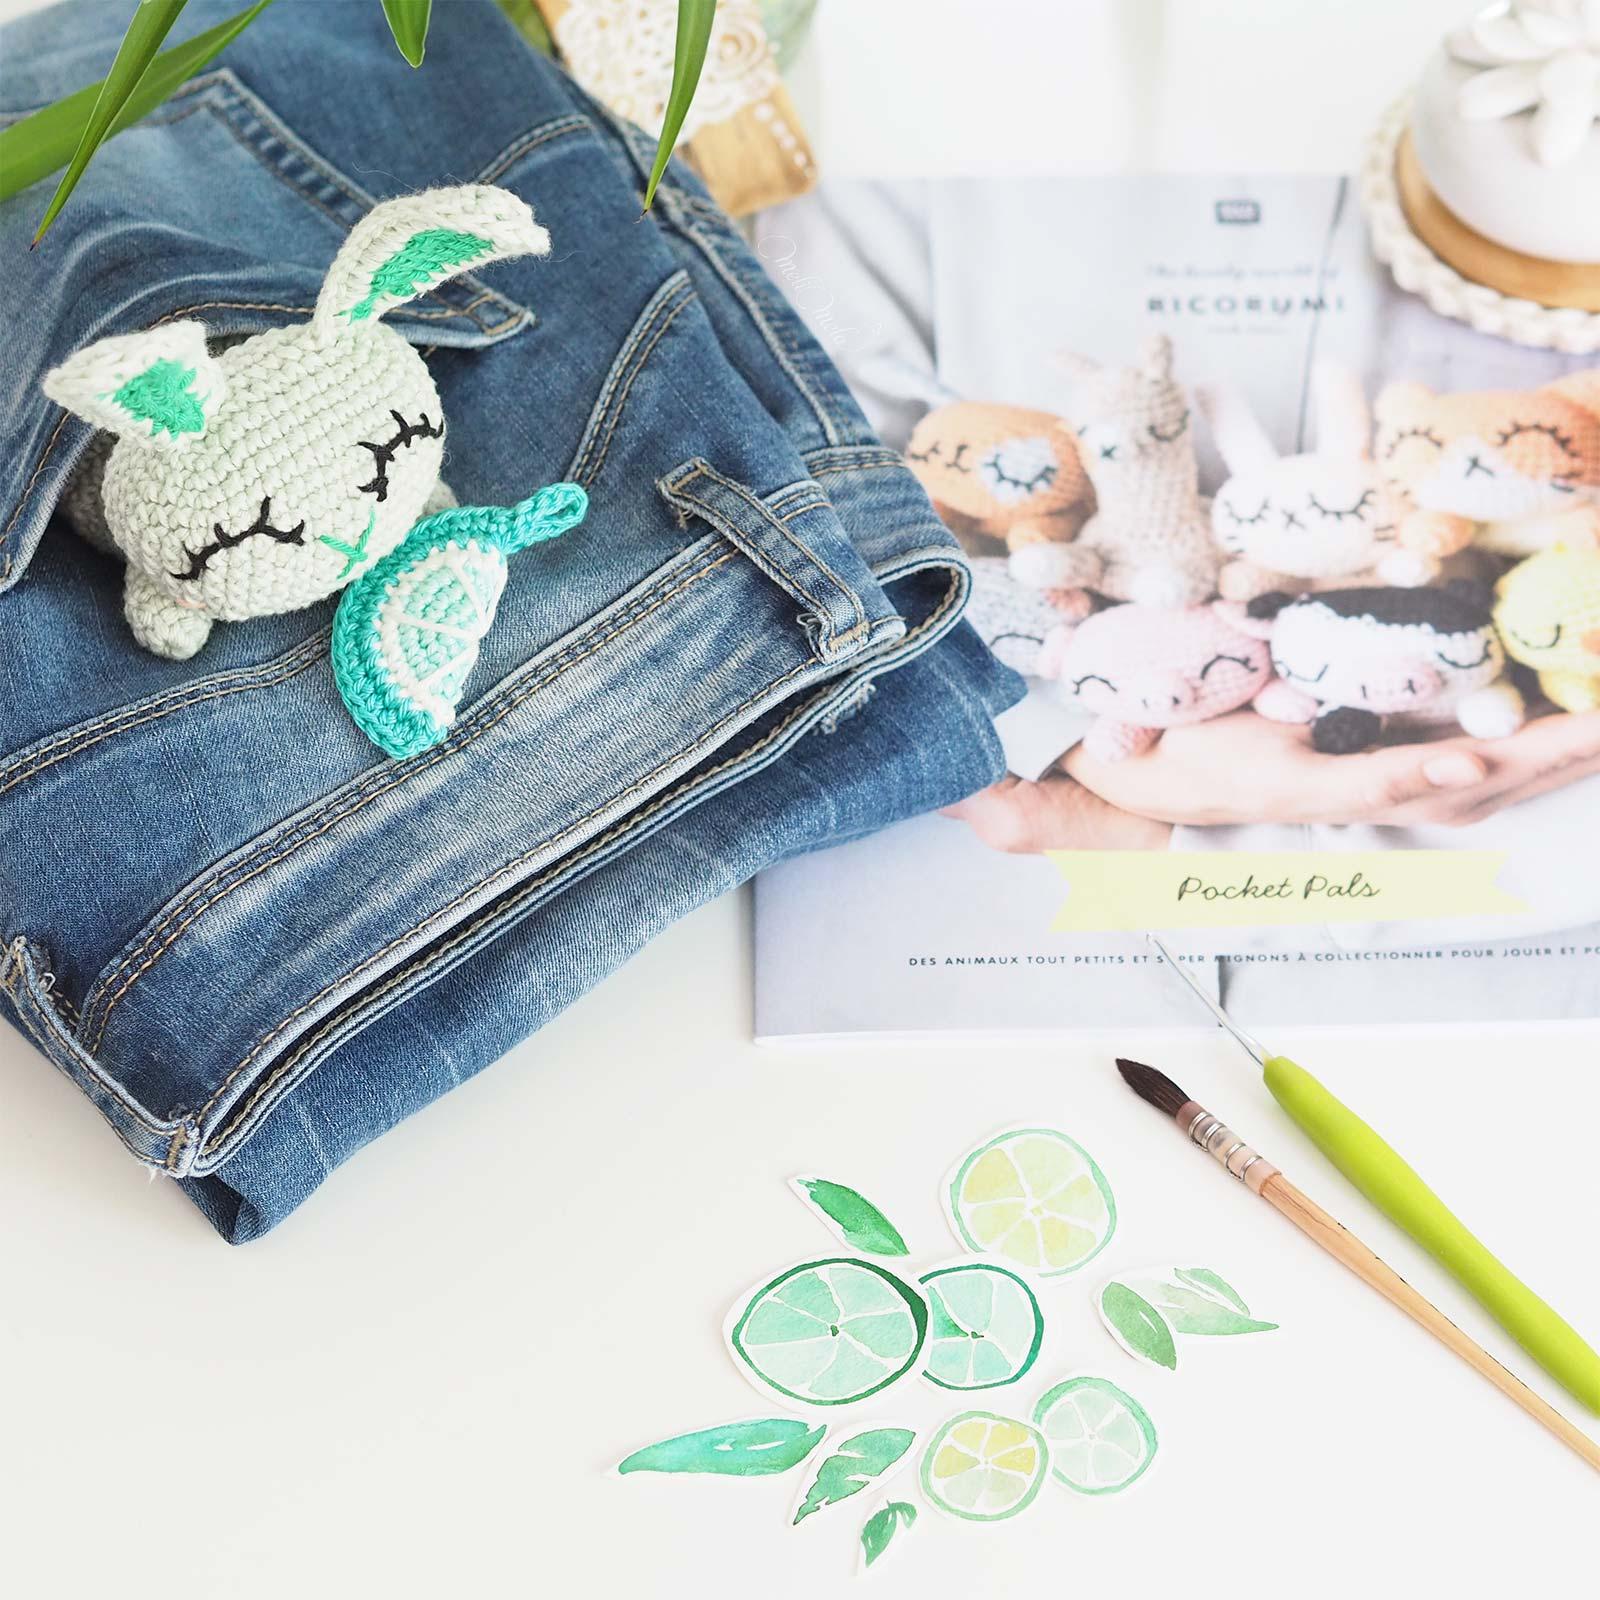 watercolor lime crochet pocket pals rabbit lapin ricorumi laboutiquedemelimelo